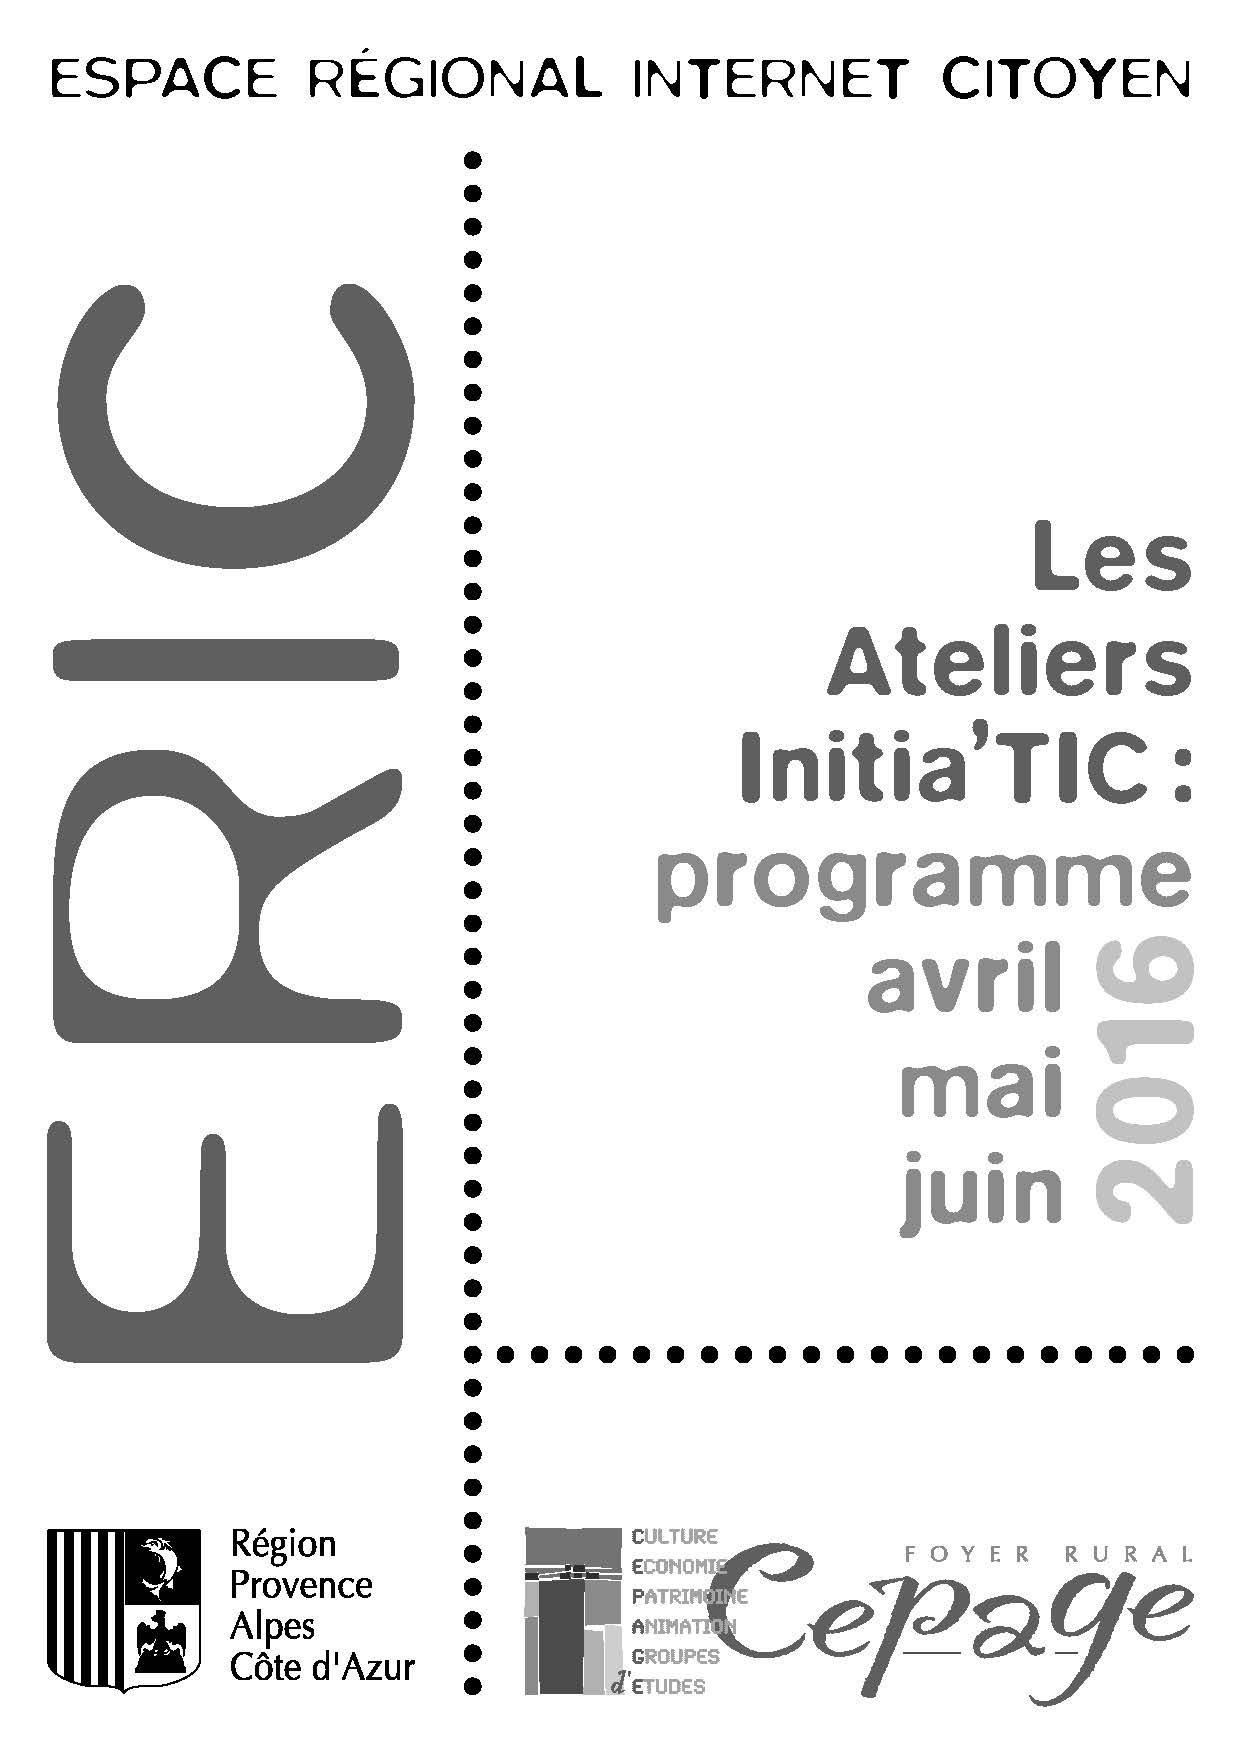 ateliers initia u2019tic 2016